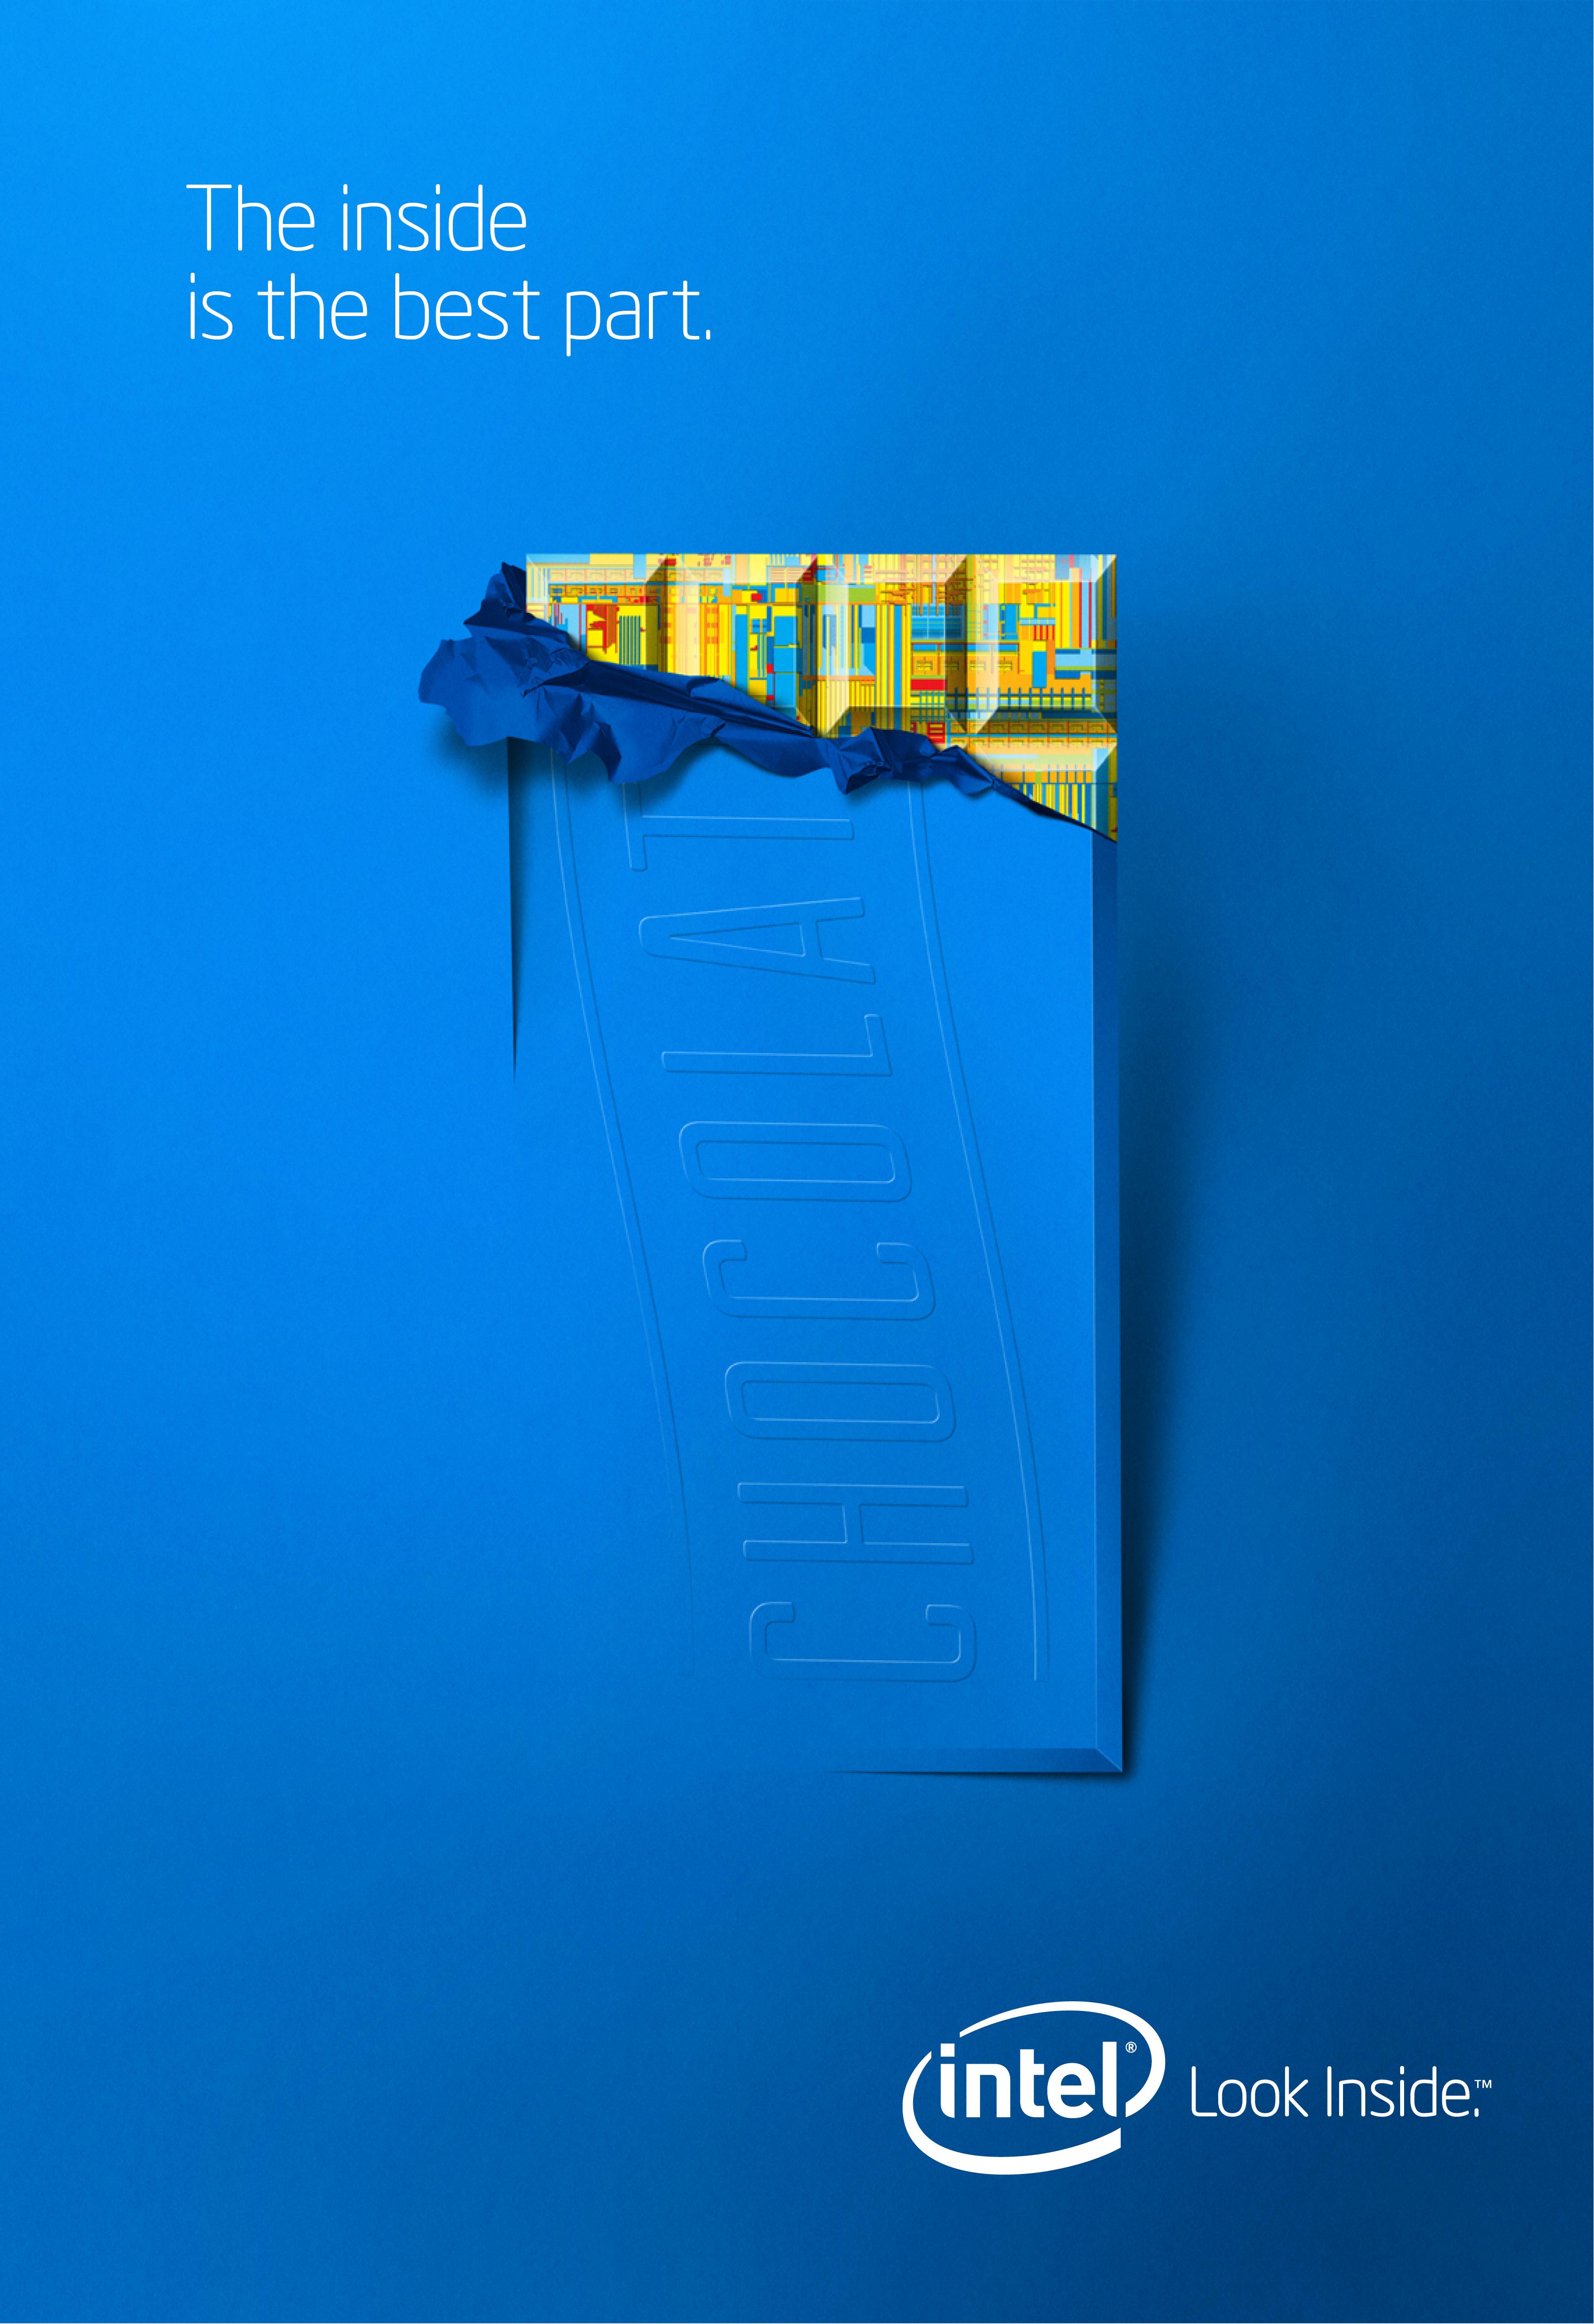 visual metaphors in advertising